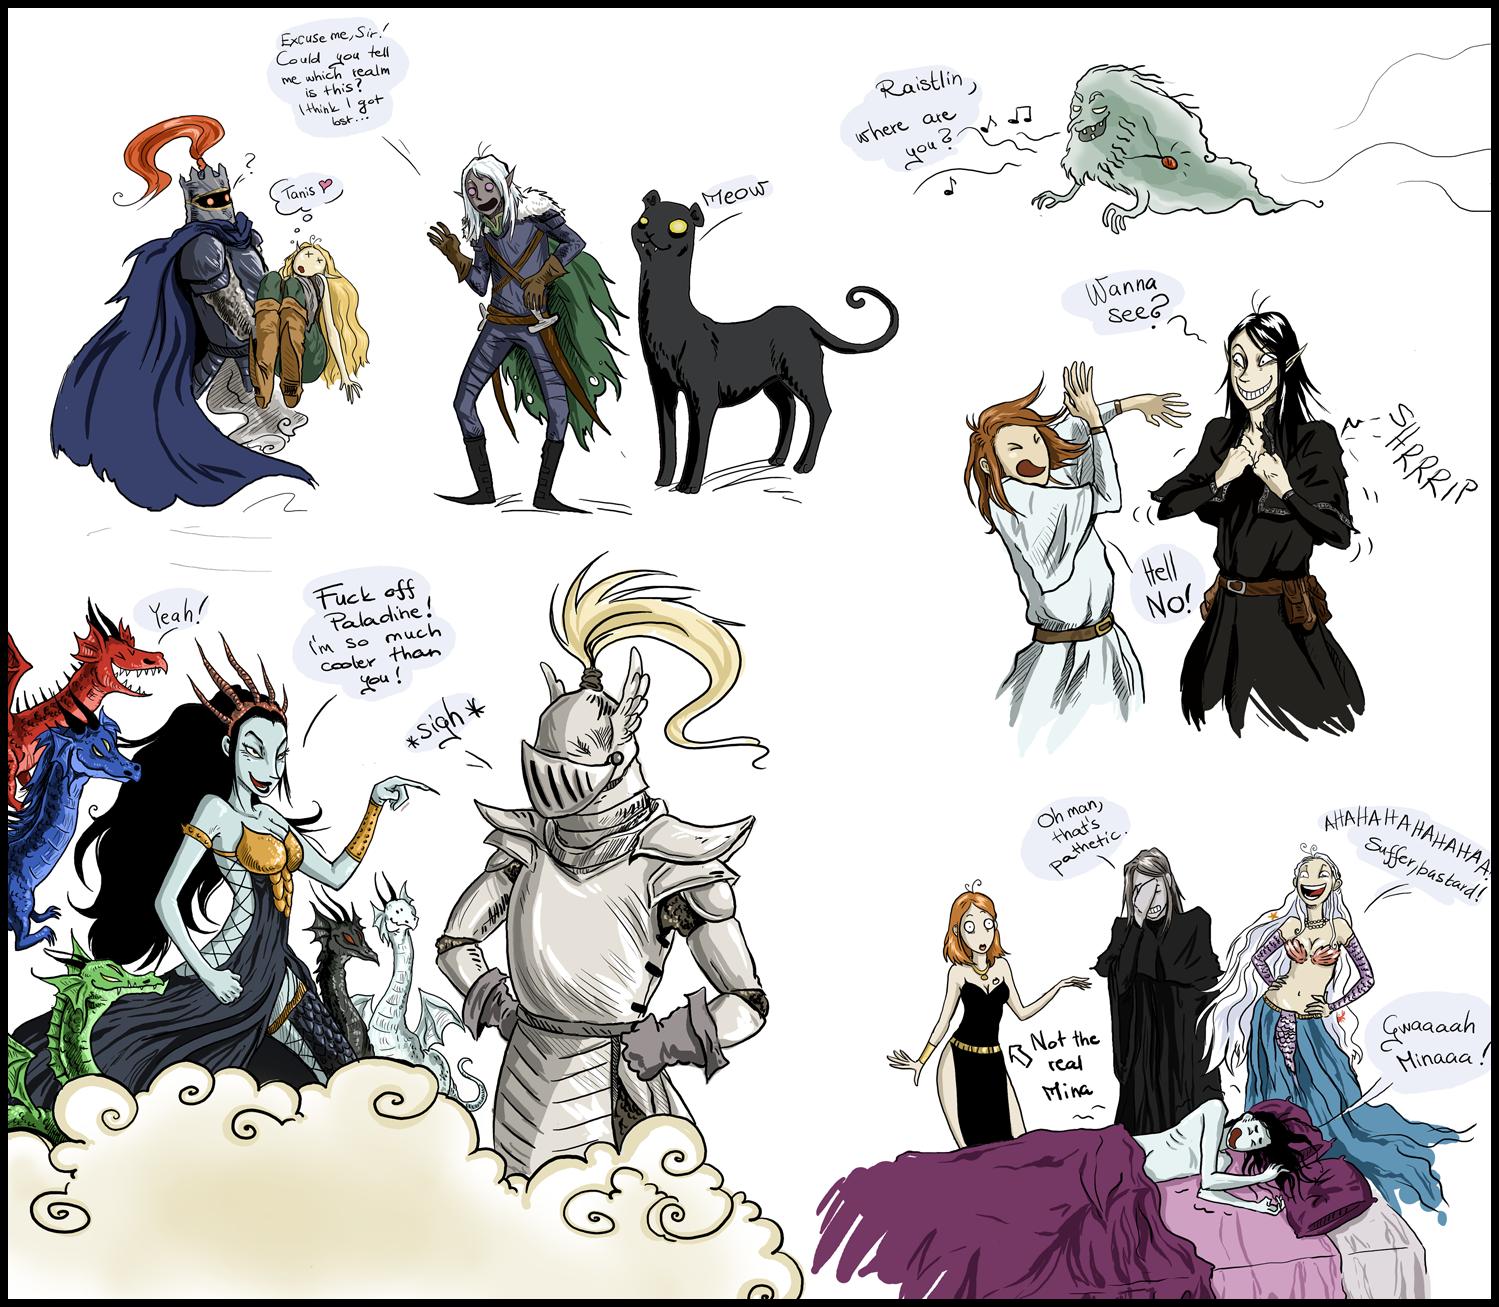 http://fc02.deviantart.net/fs71/f/2012/088/0/b/random_heroes_and_villains___dragonlance_by_szacsi-d4u8yd3.png